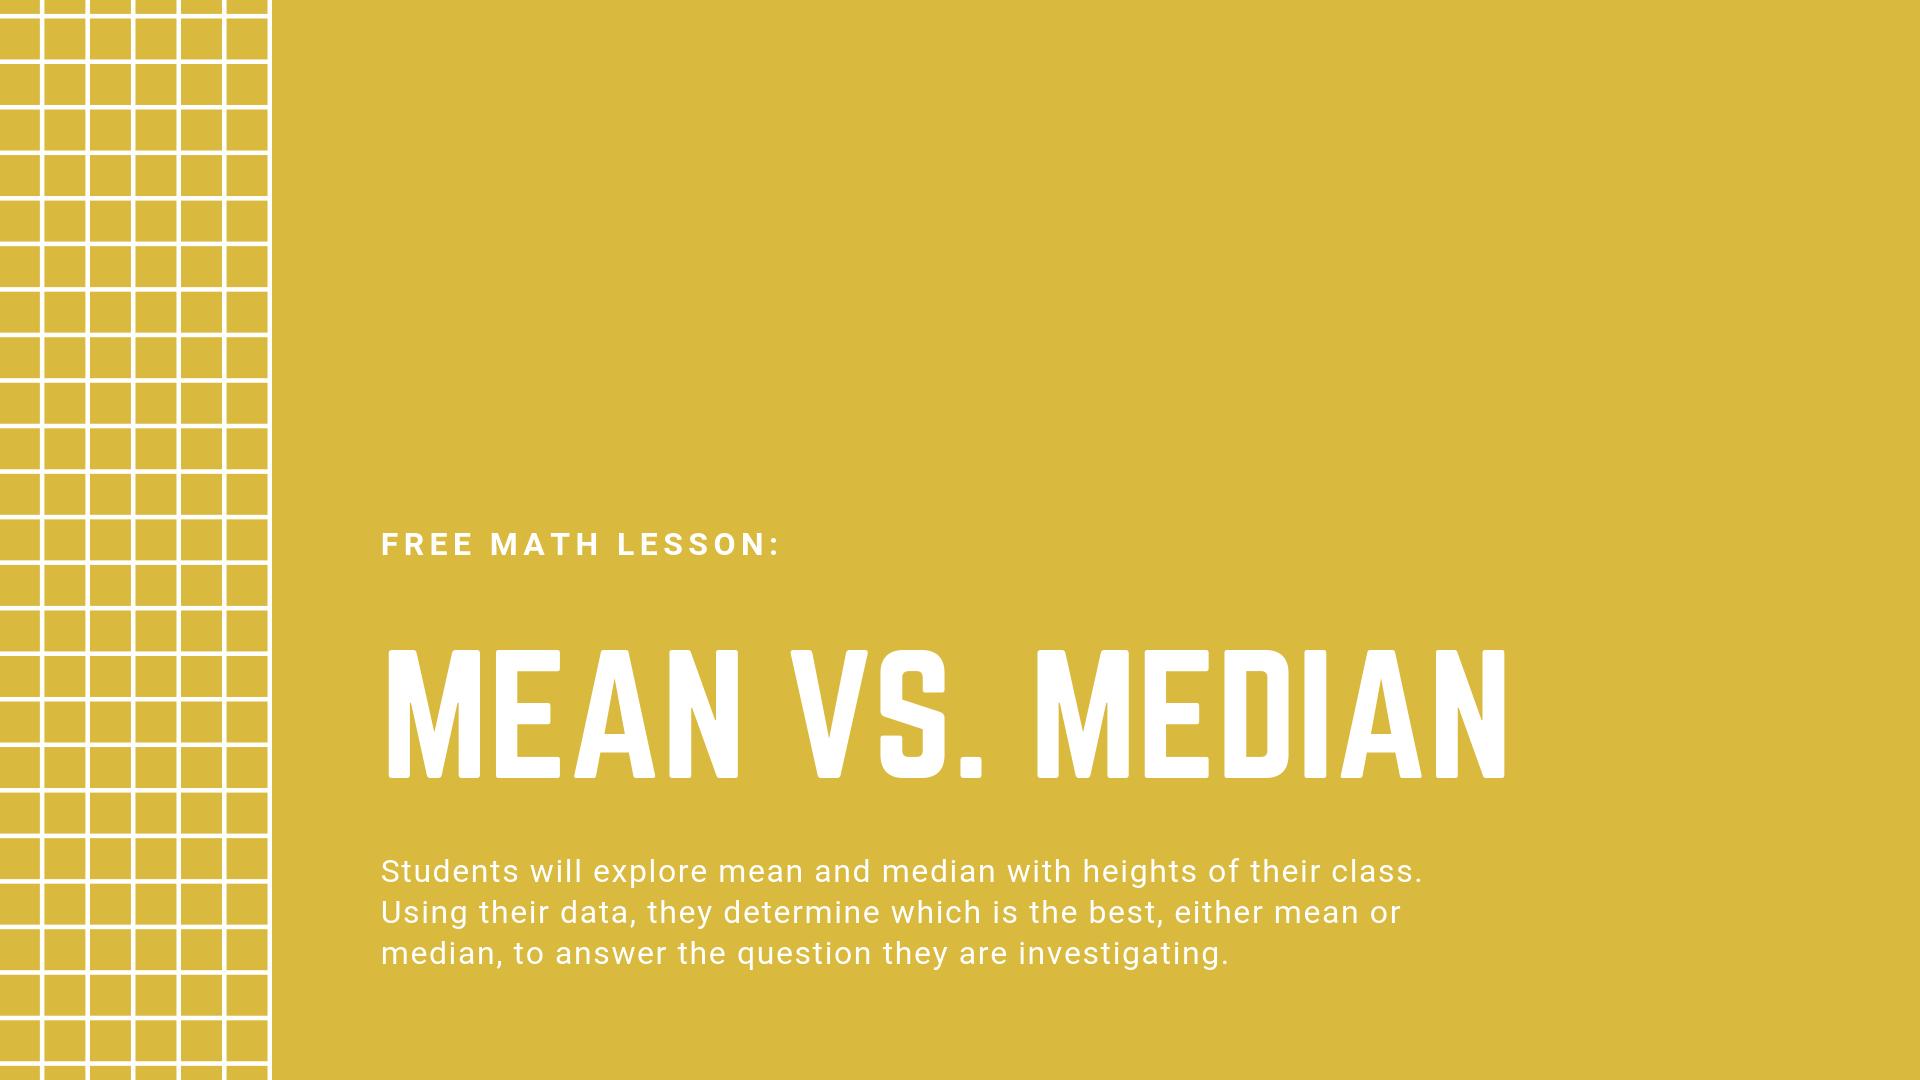 Free Math Lesson Mean Vs Median